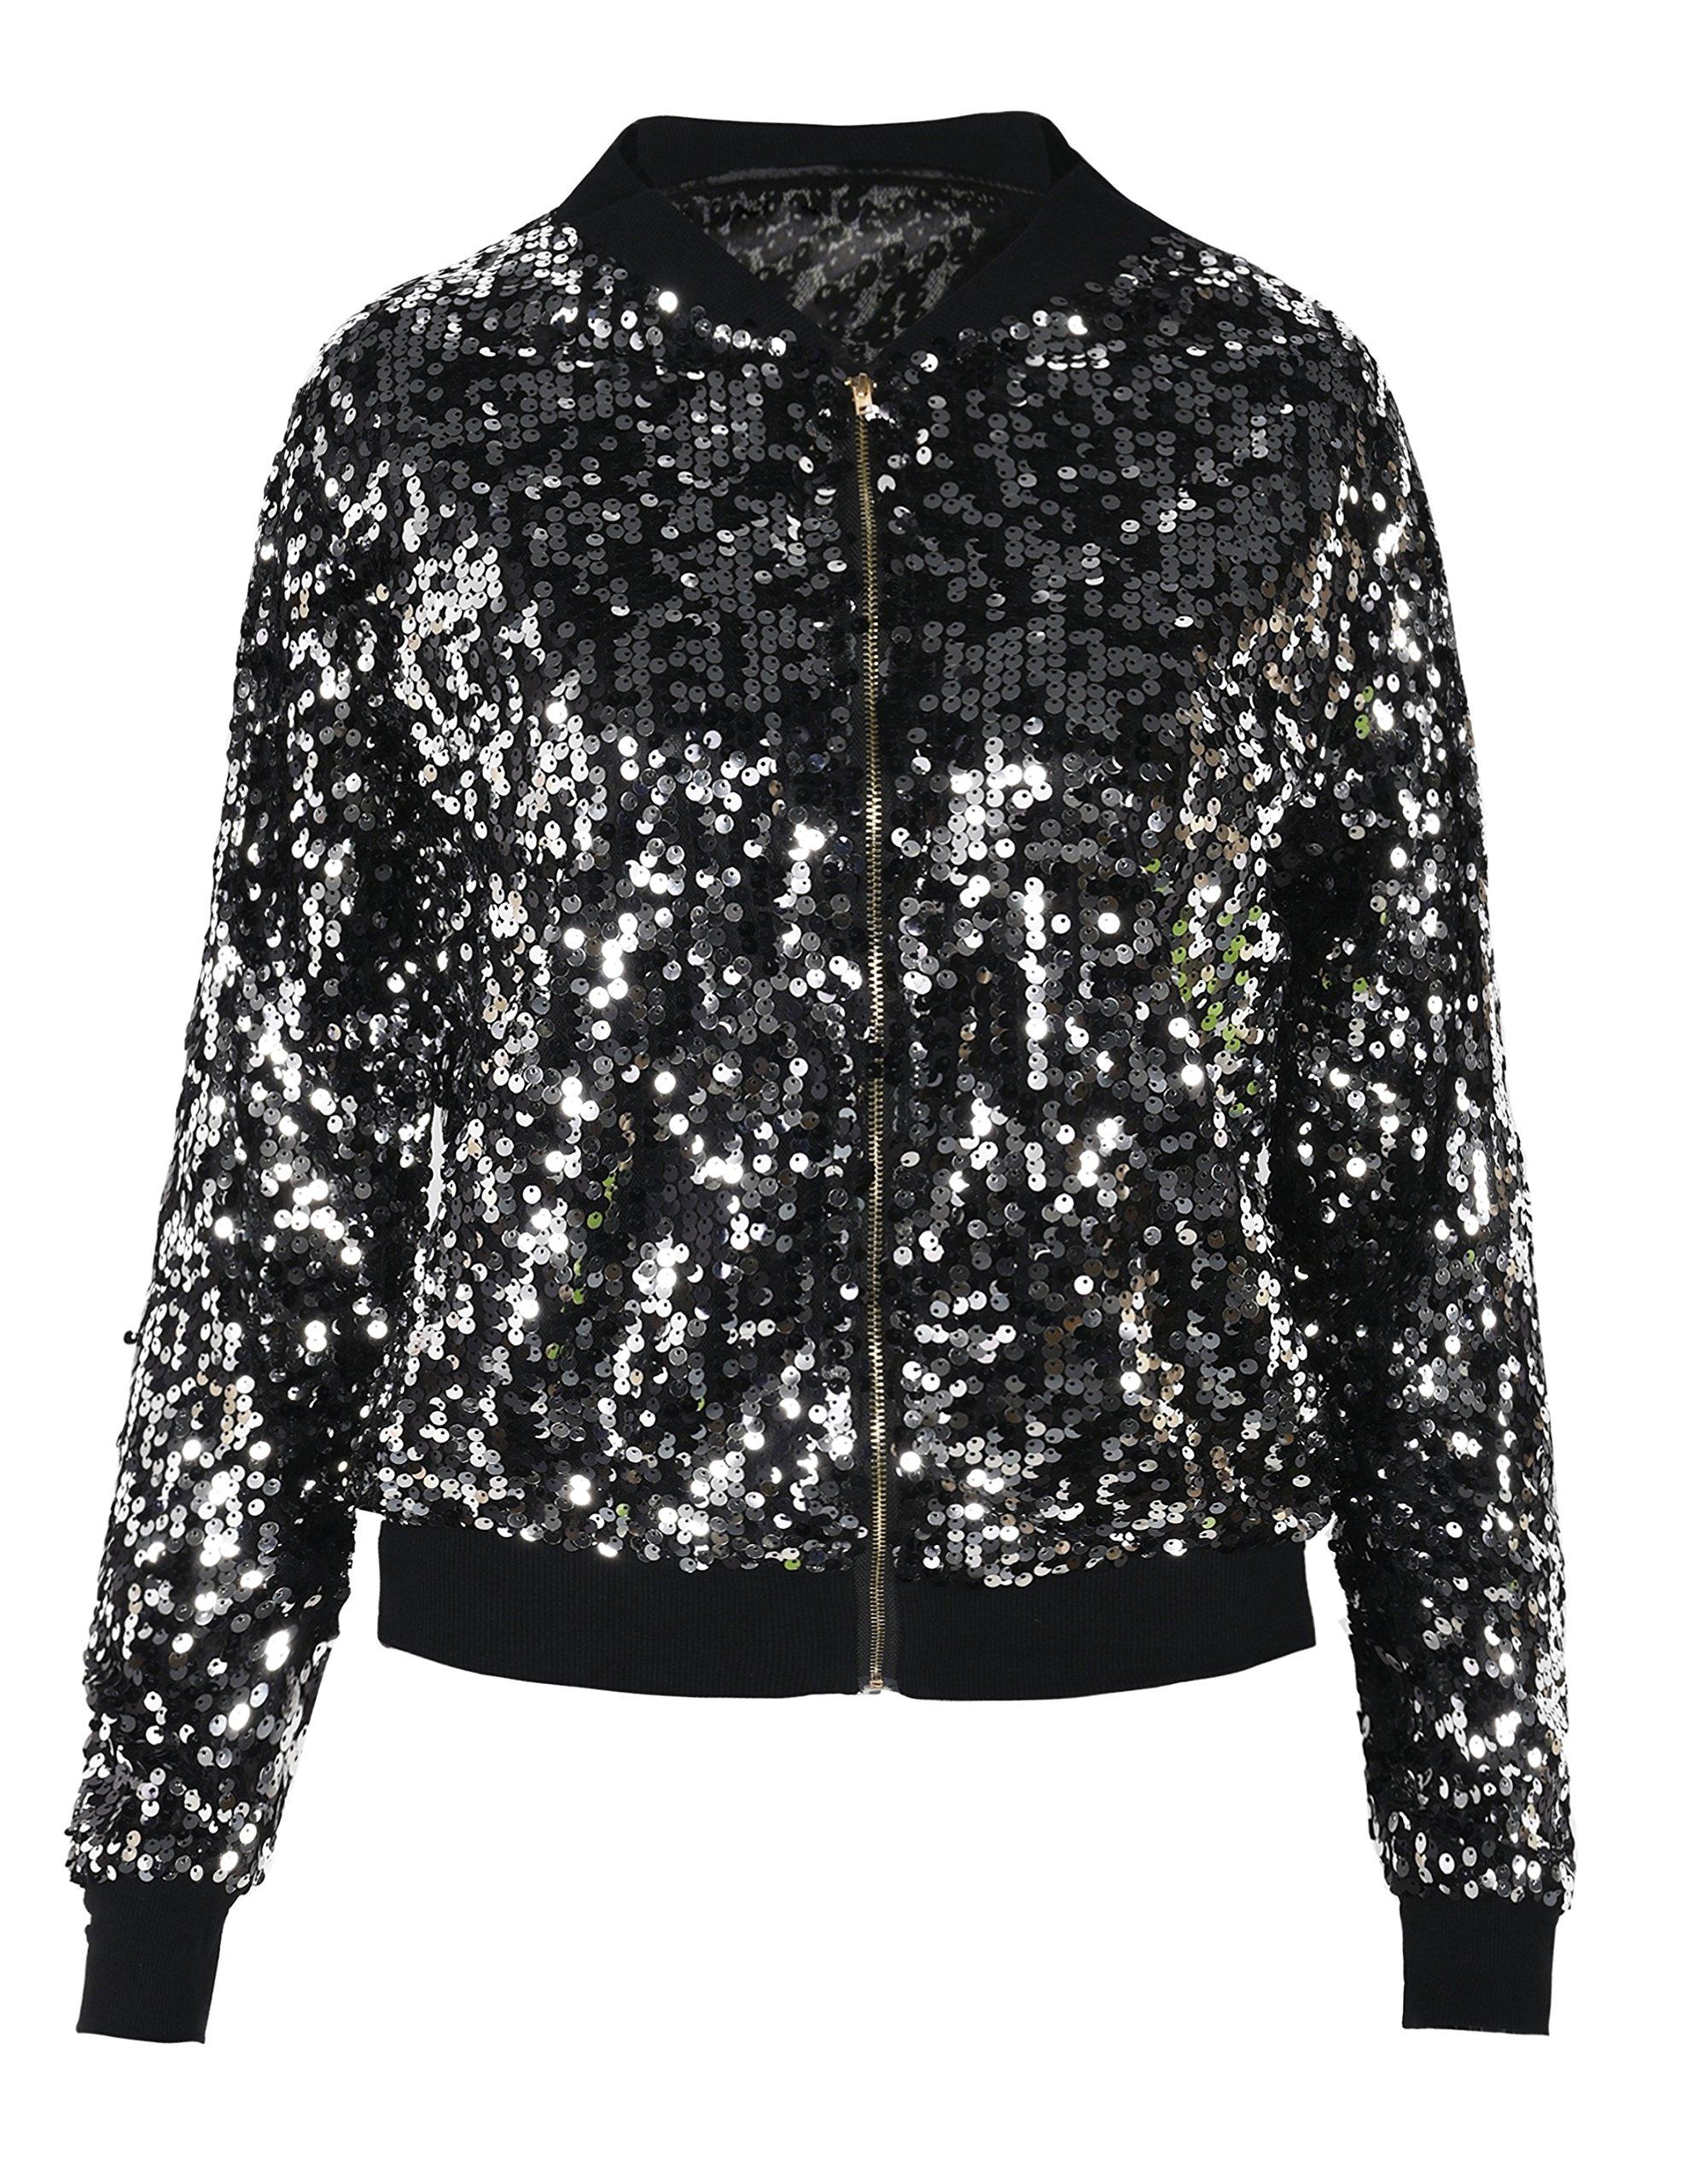 PrettyGuide Women's Sequin Top Lightweight Cardigan Bomber Jacket Outwear L/8-10 Black Silver